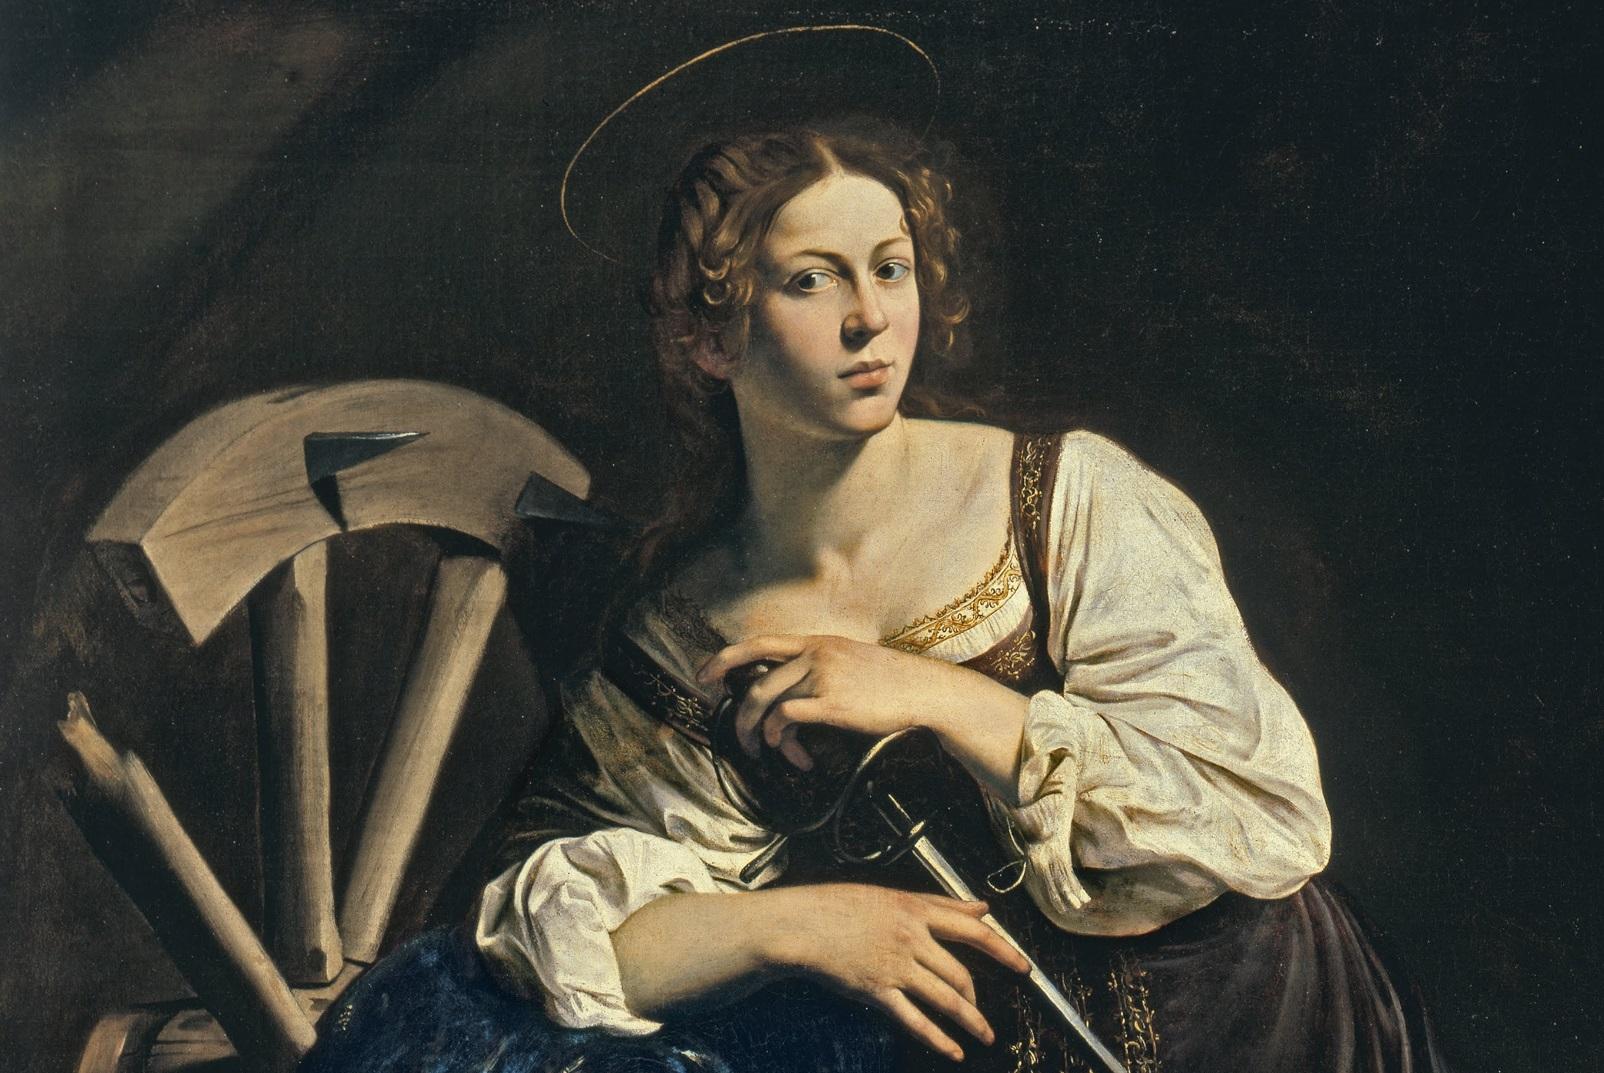 caravaggio-stkat-1598c-det.jpg